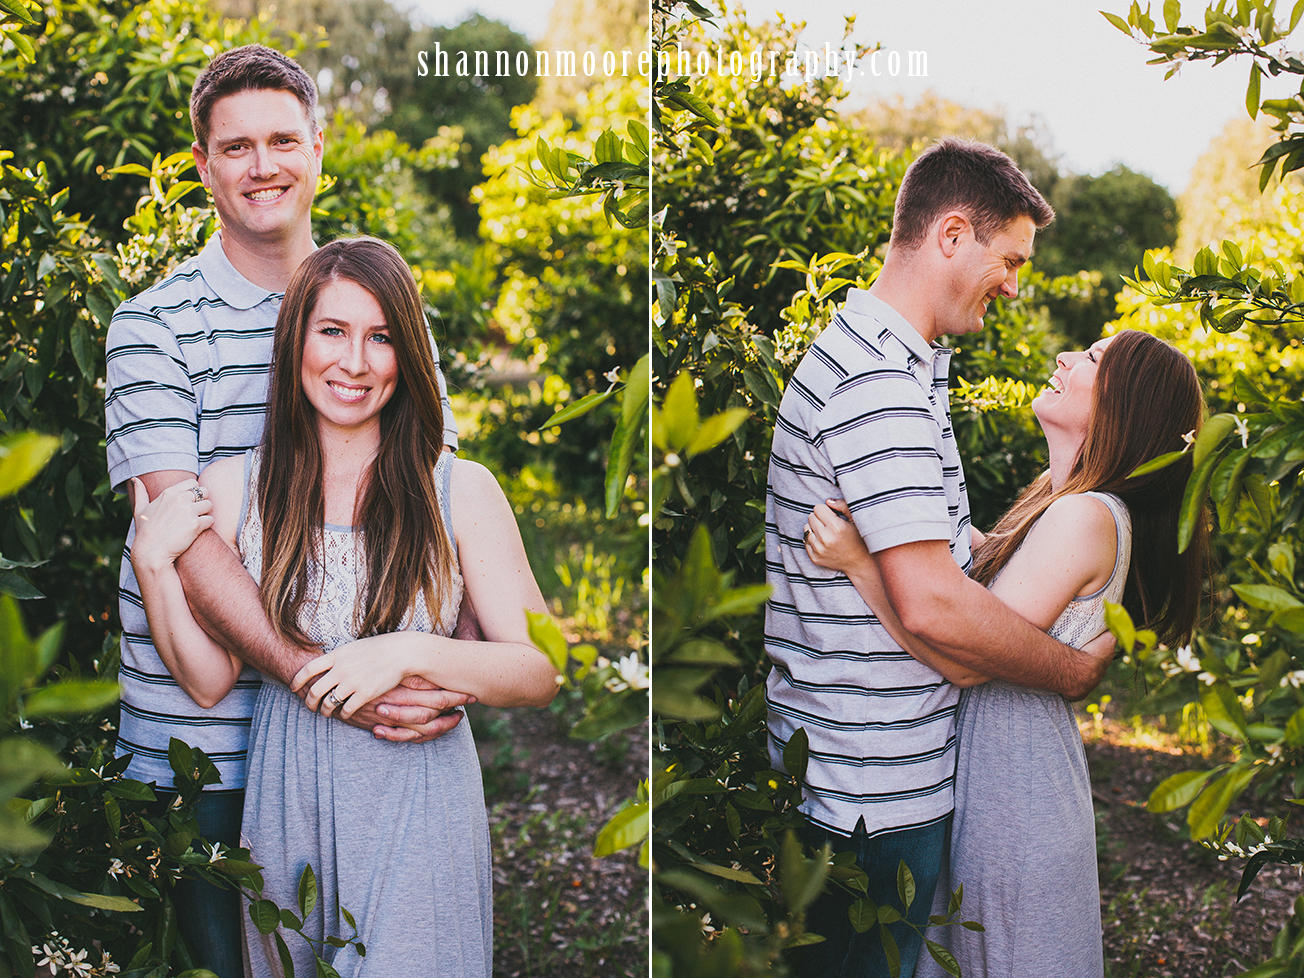 ShannonMoorePhotography-FamilyPhotography-SanLuisObispo-Ca-15